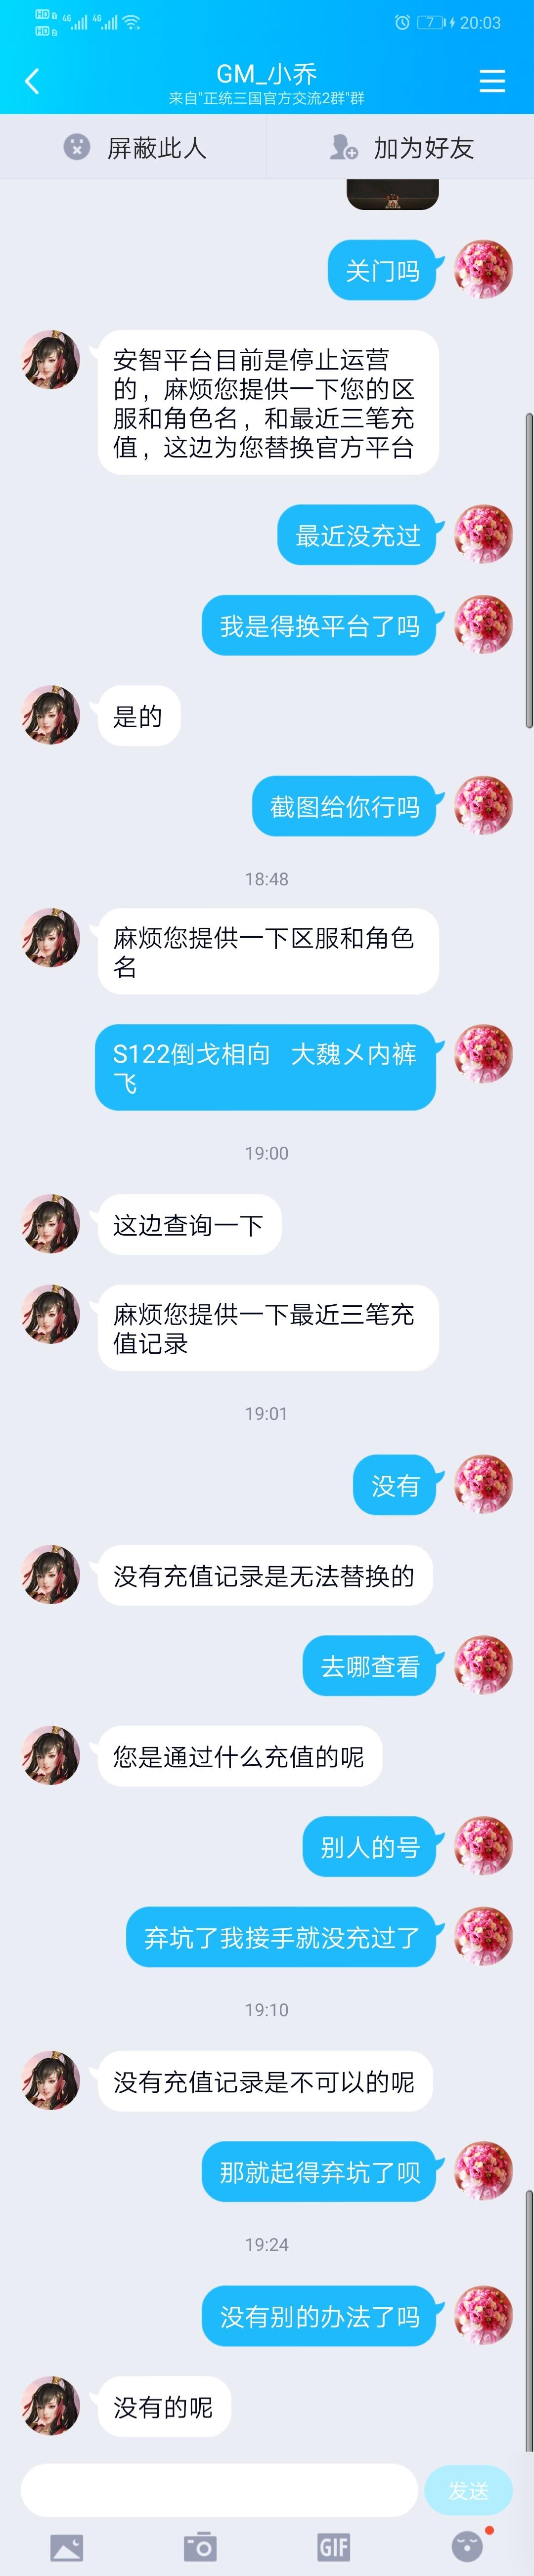 Screenshot_20191220_200318_com.tencent.mobileqq.jpg